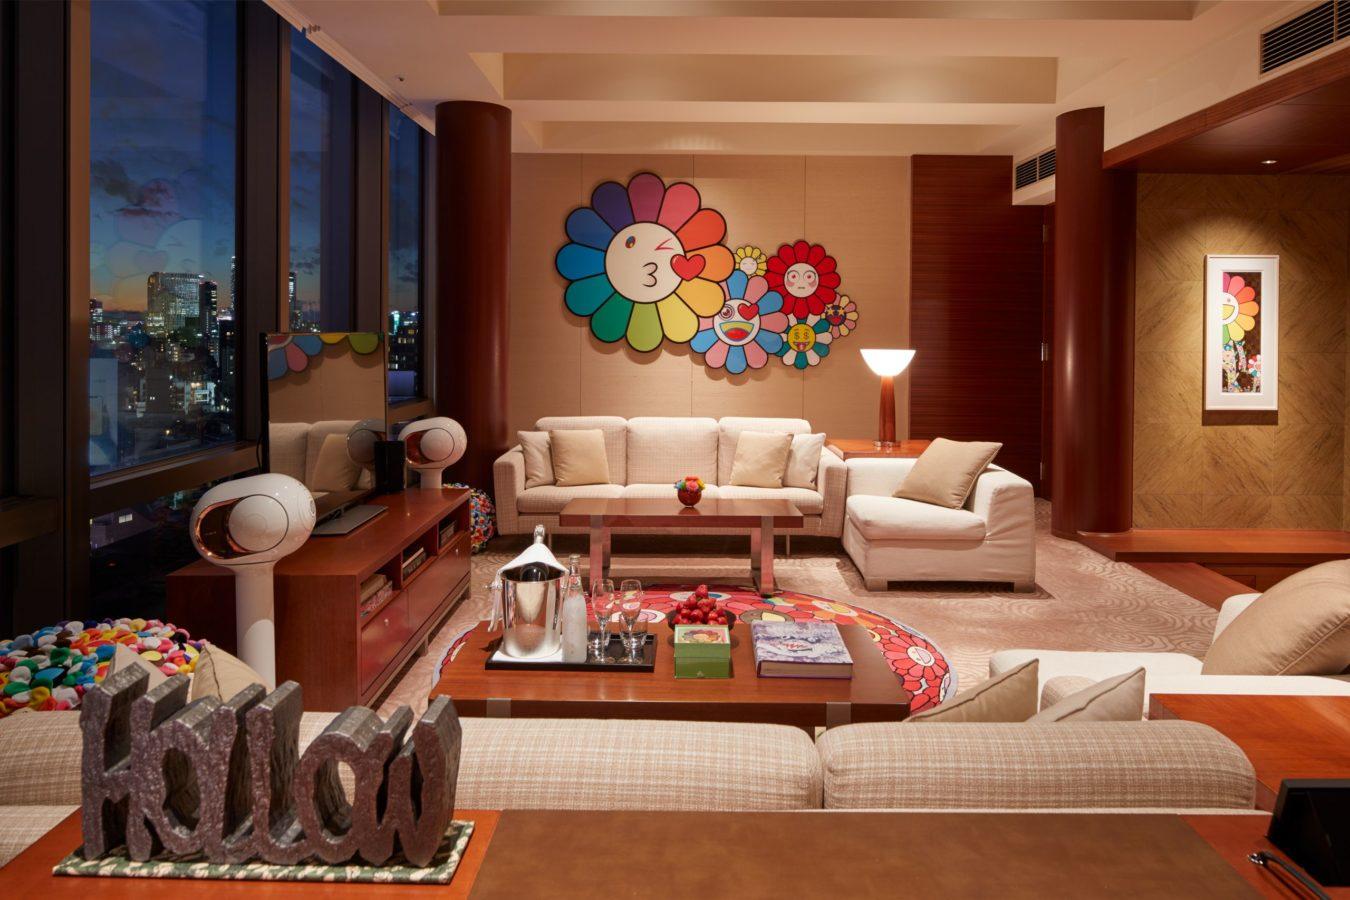 Takashi Murakami Transforms Grand Hyatt Tokyo into A World of Colourful Wonder